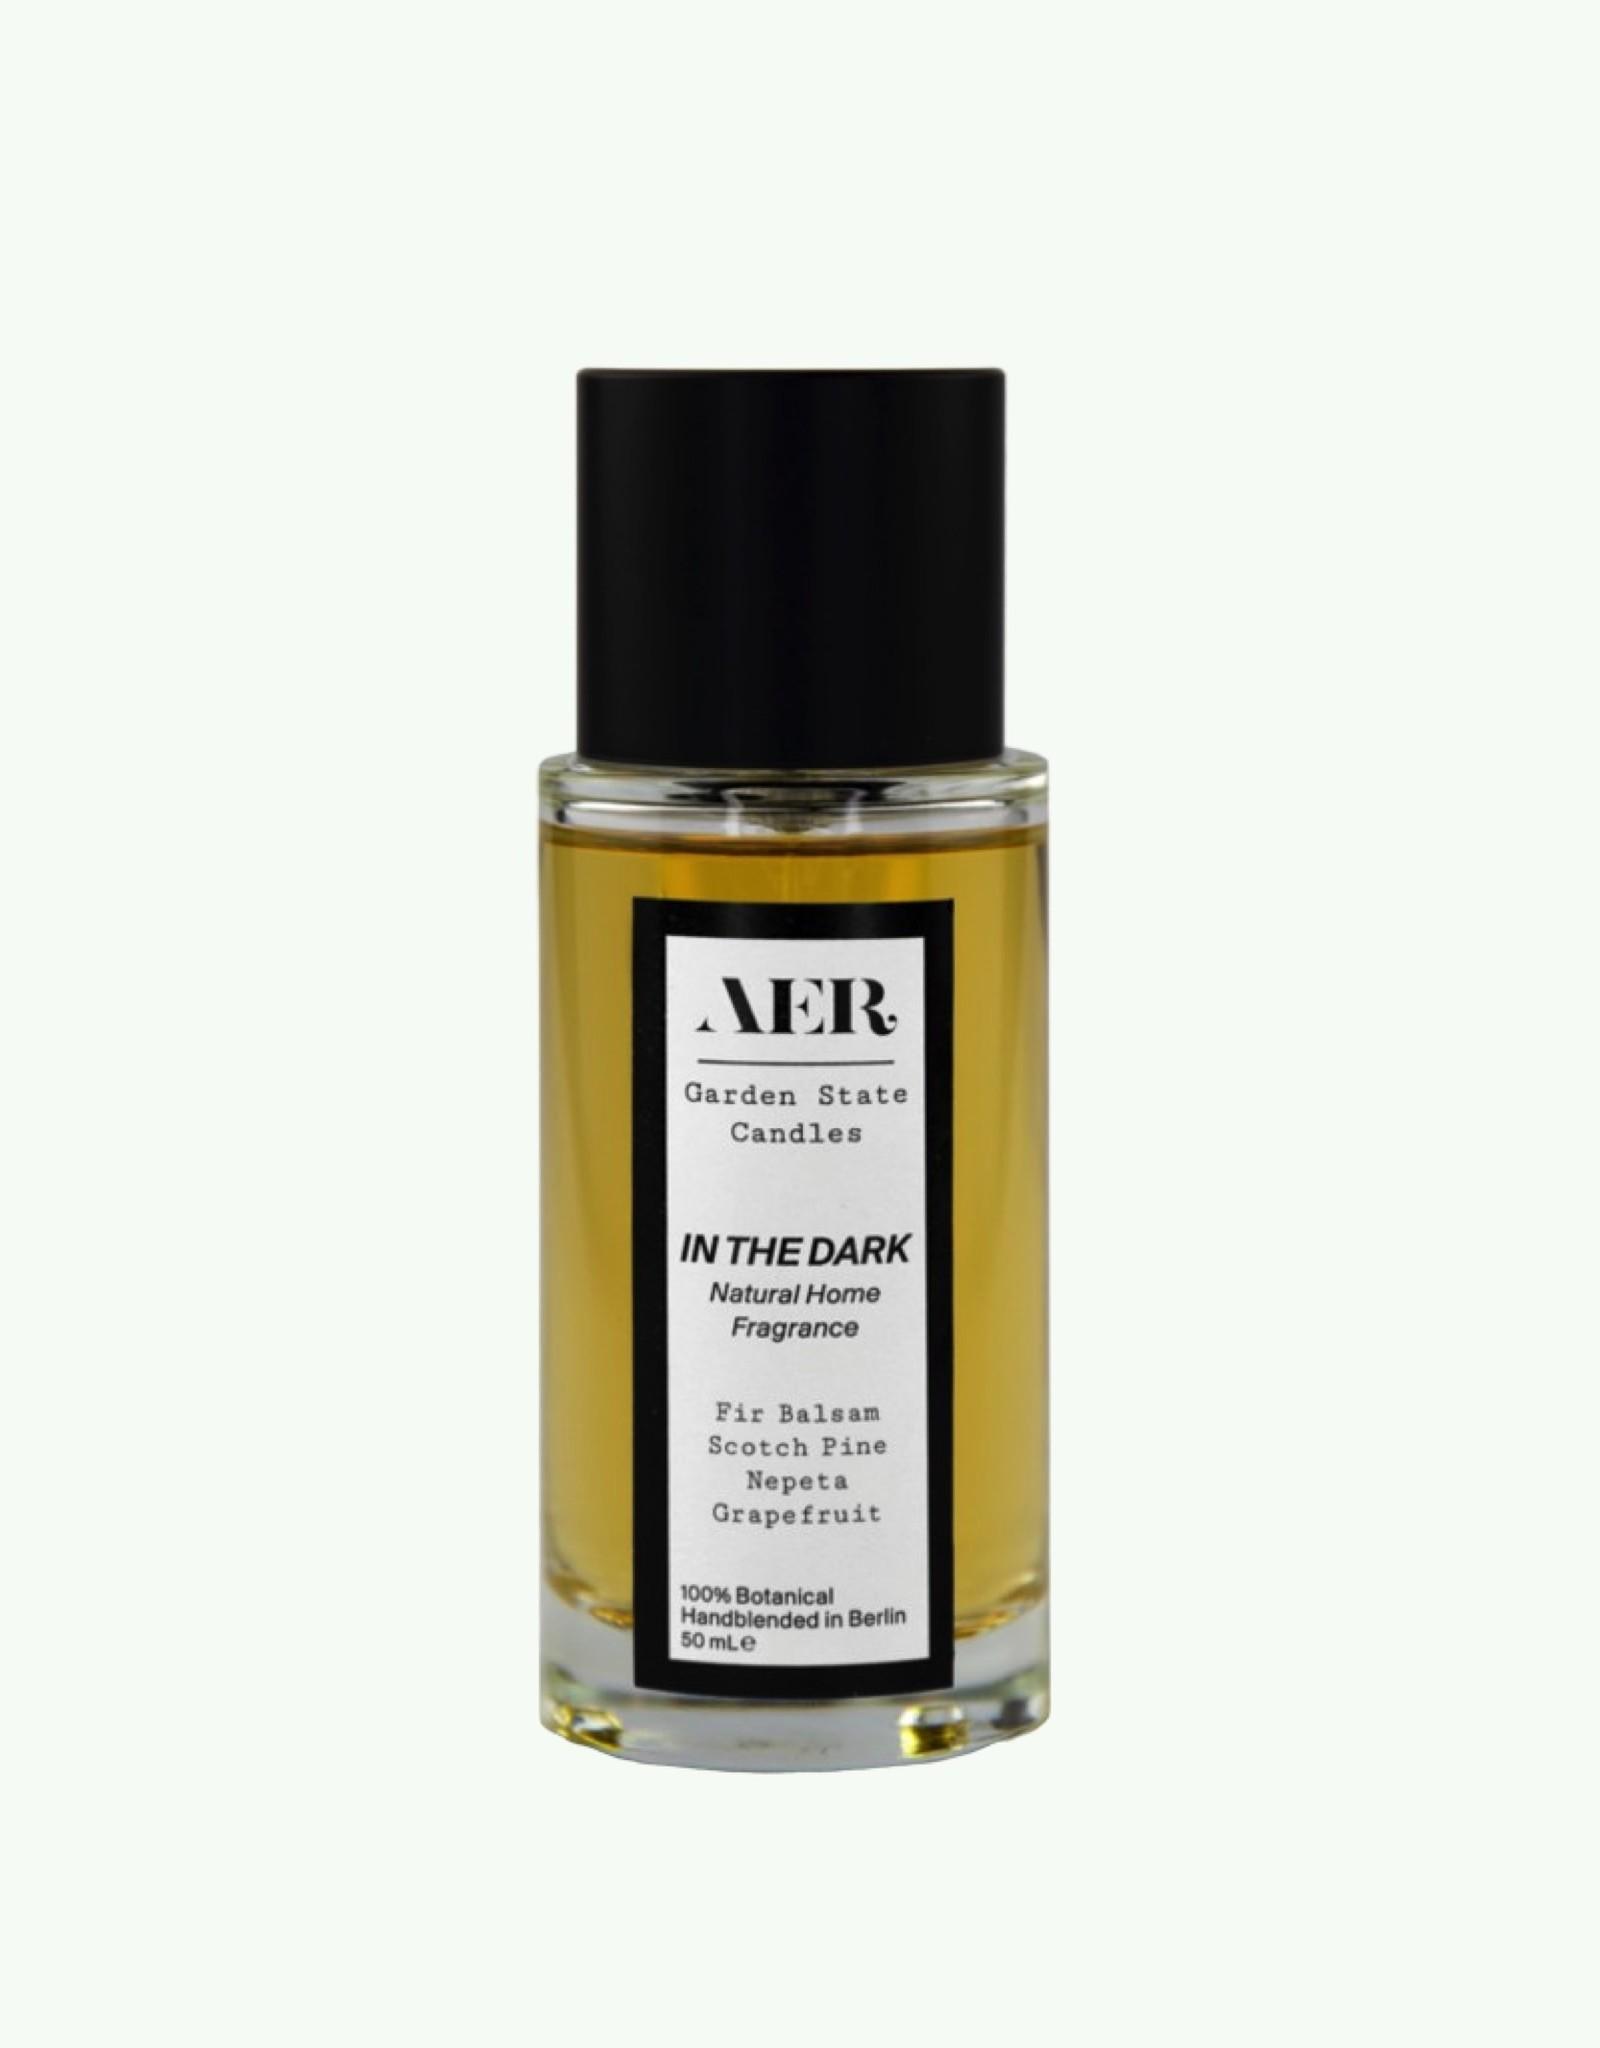 Aer AER - IN THE DARK - Homespray 50 ml